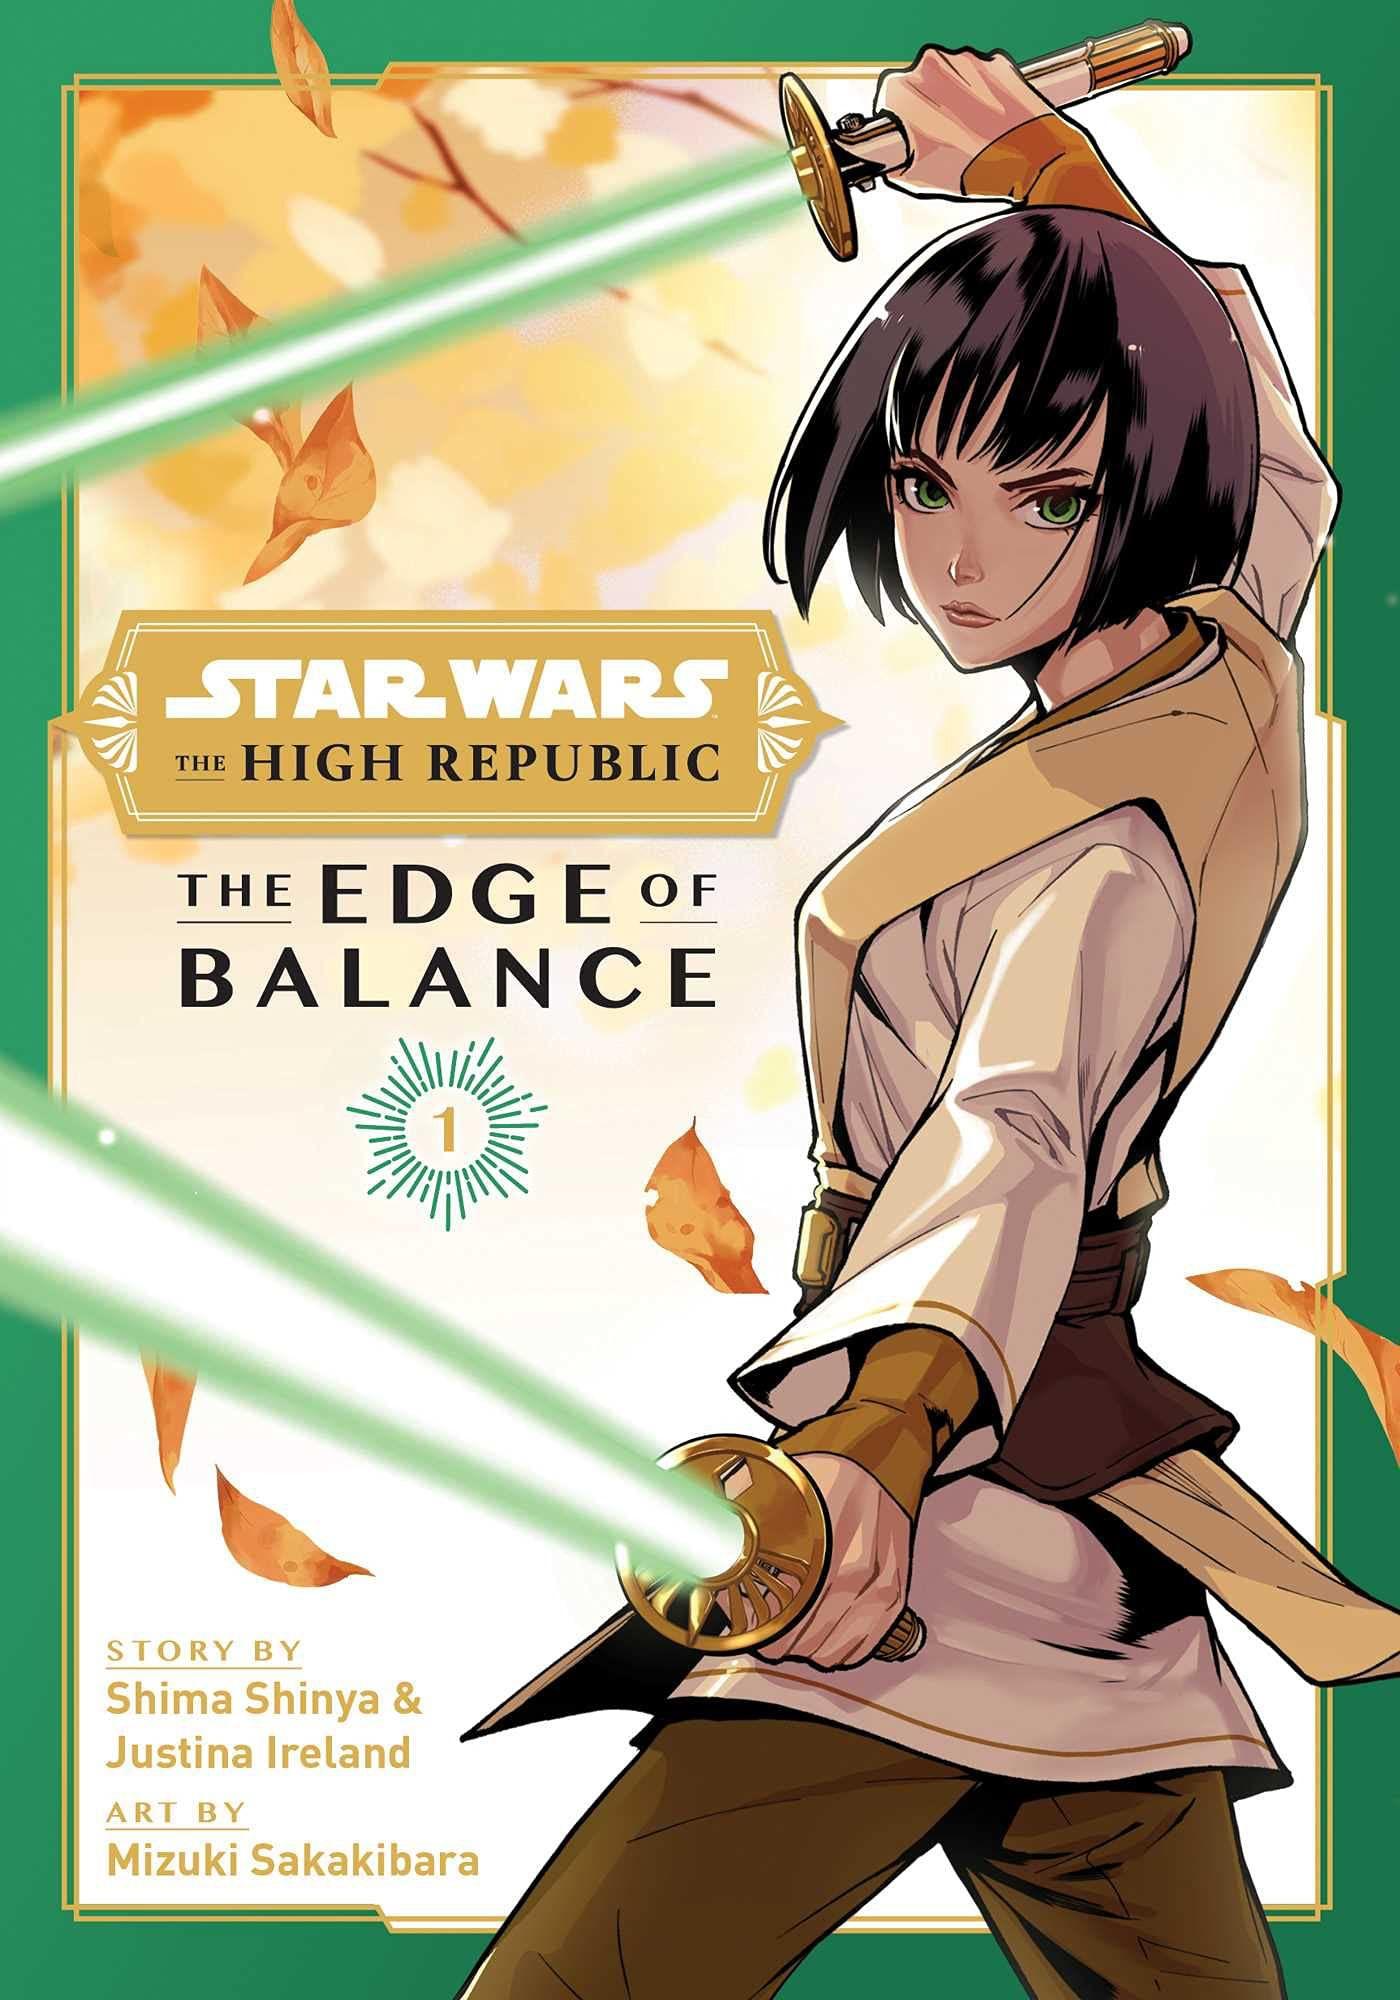 Star Wars The Edge of Balance